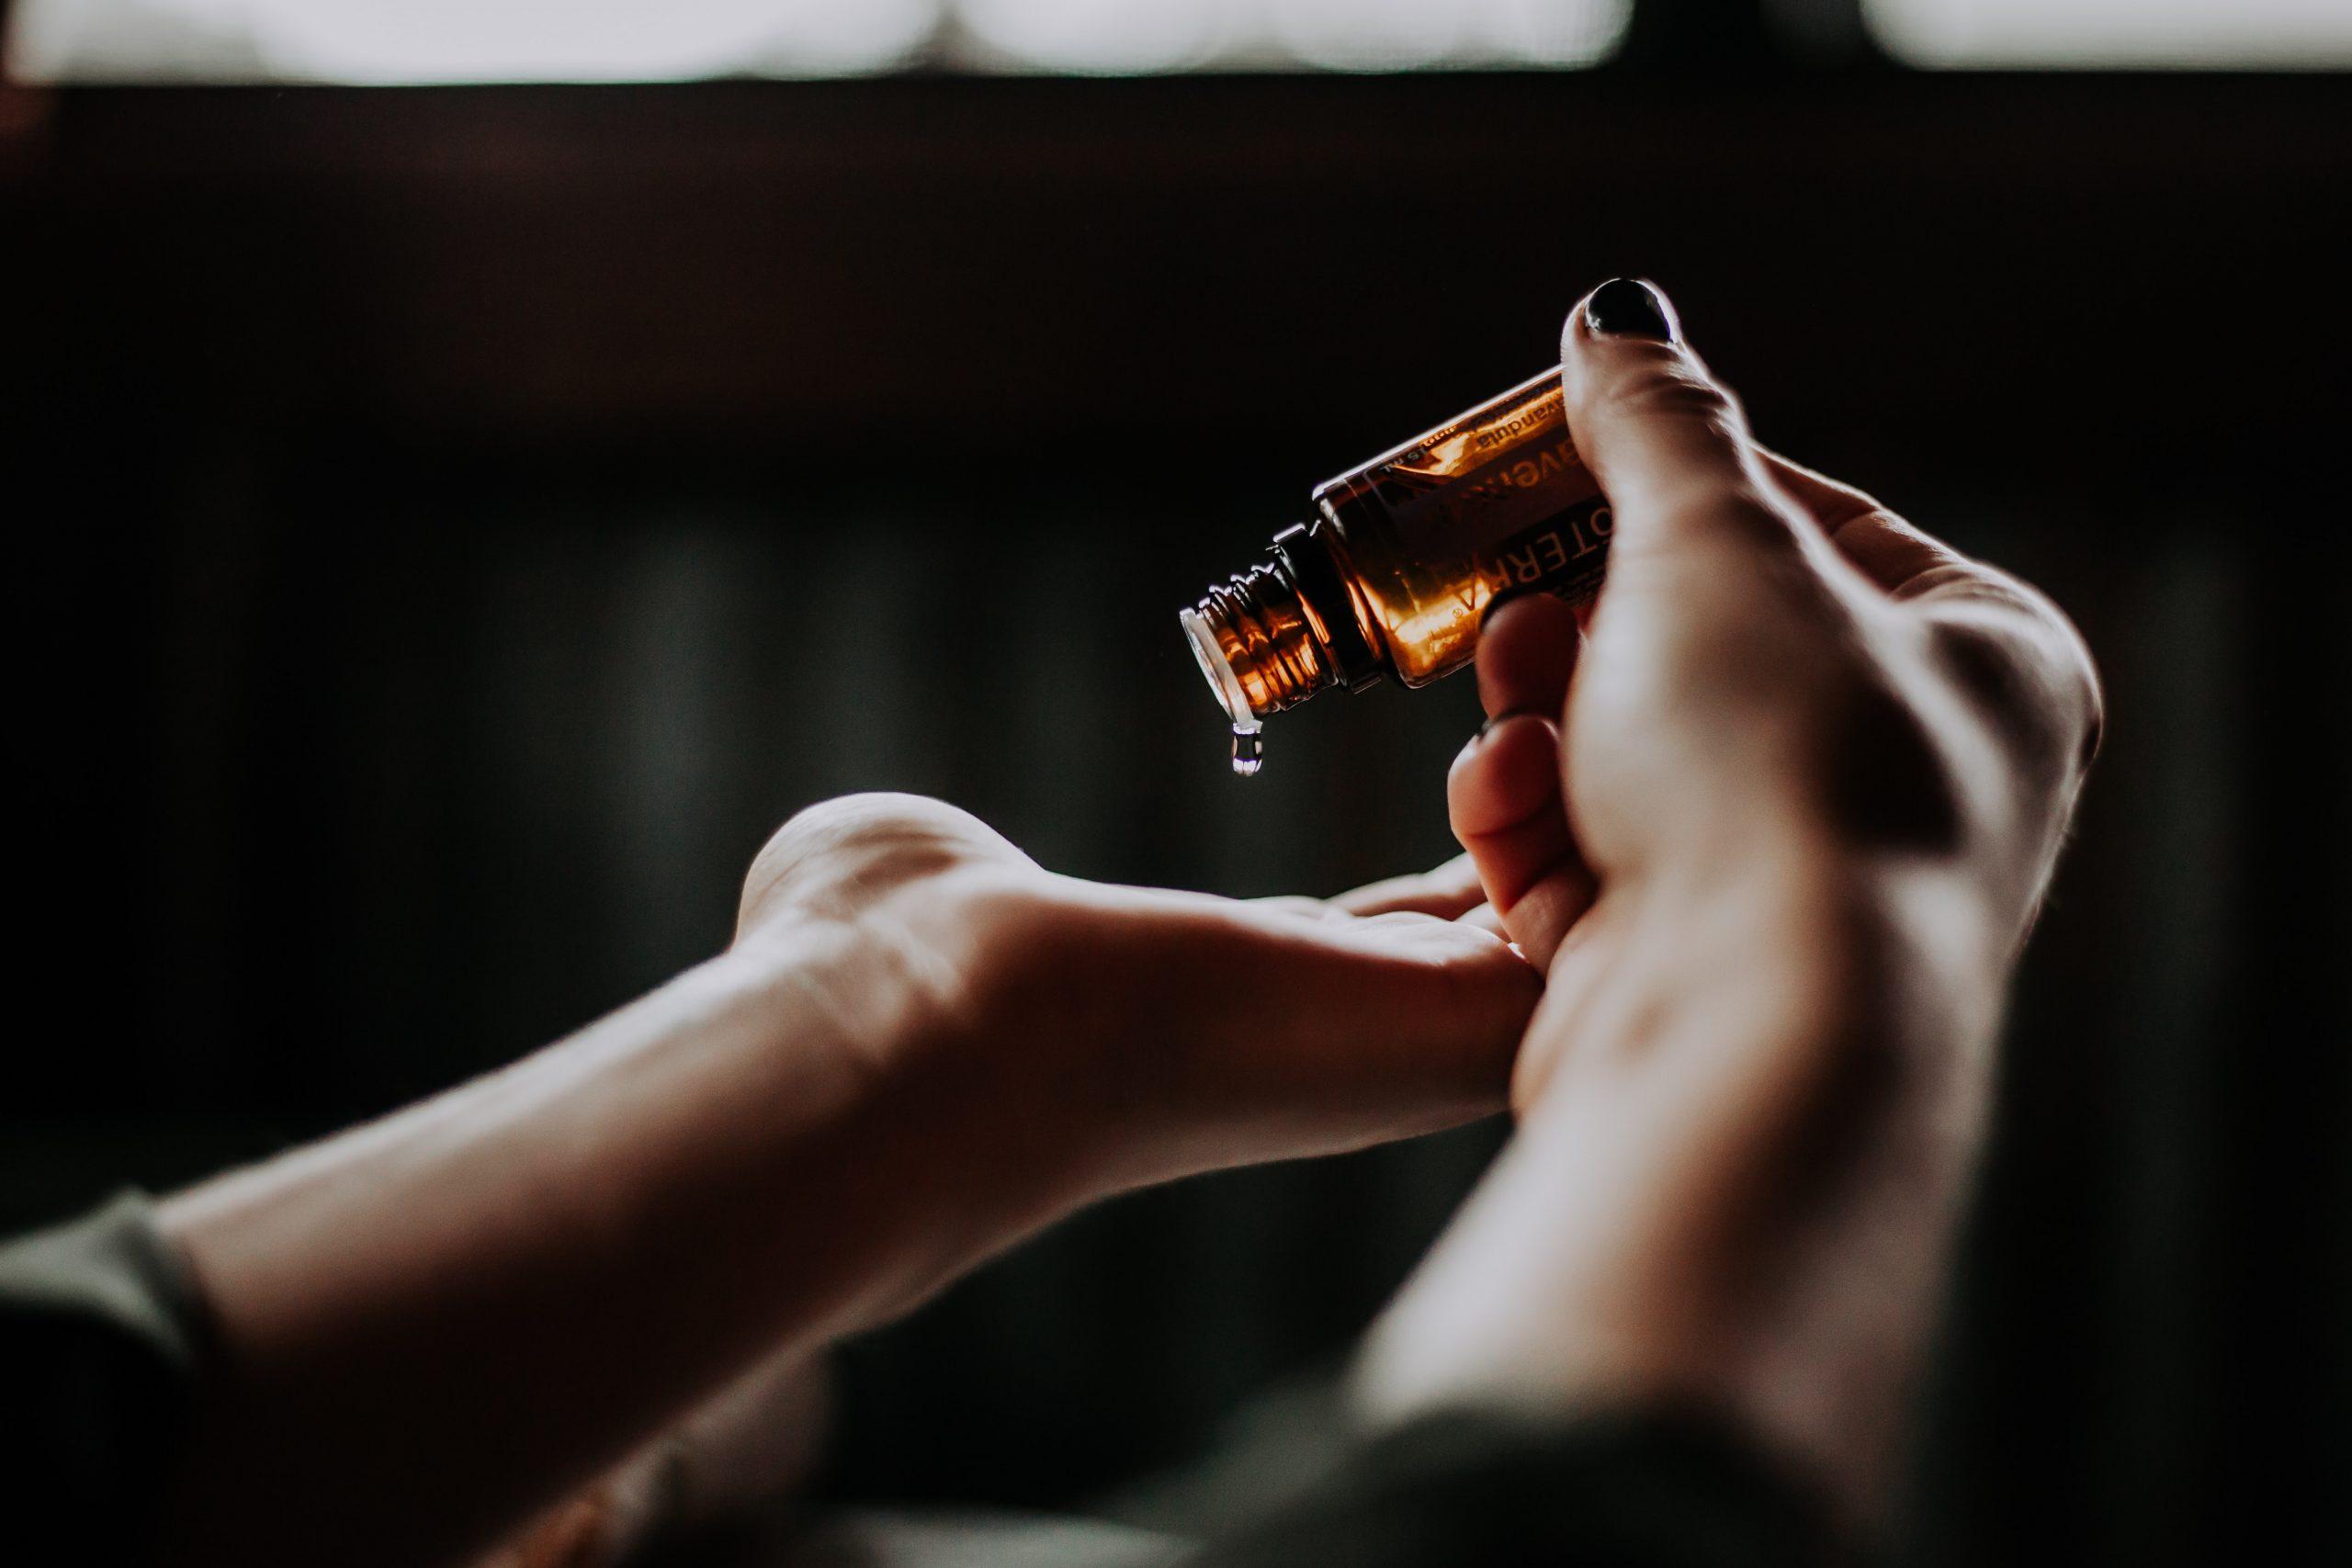 huile-cannabis-relaxatiaon-bienfaits